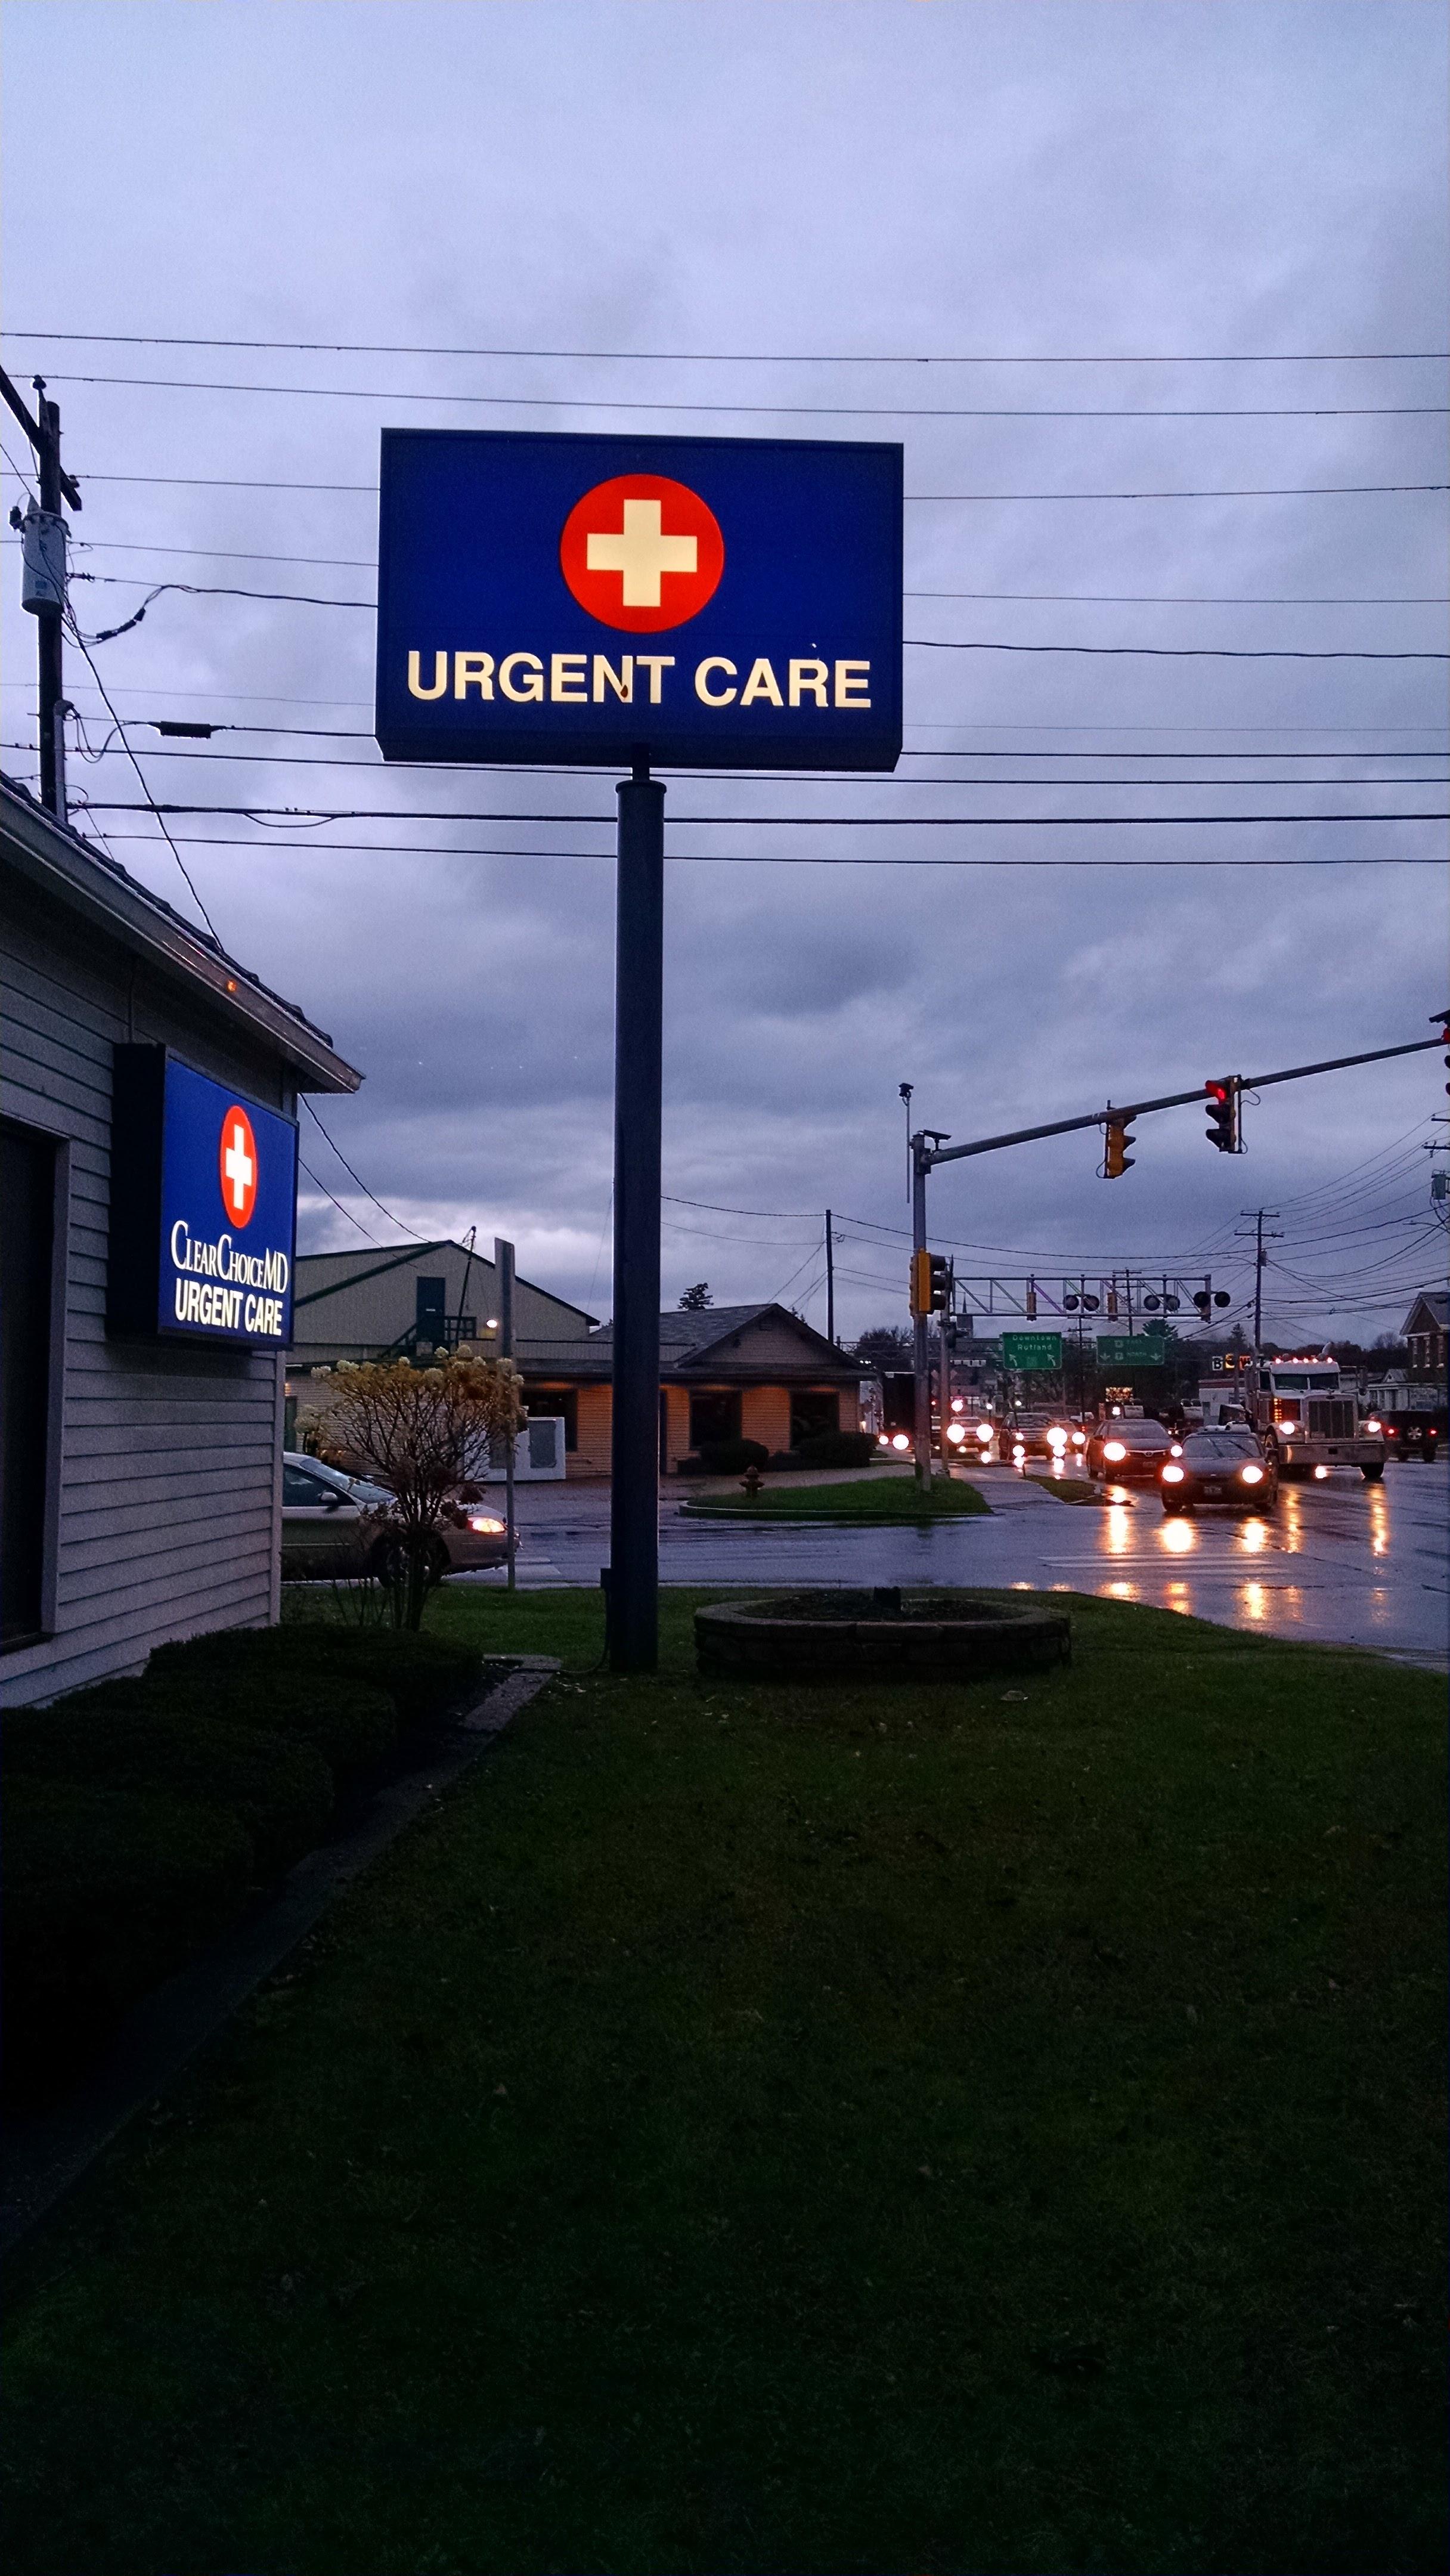 ClearChoiceMD Urgent Care - Rutland, VT - Urgent Care Solv in Rutland, VT